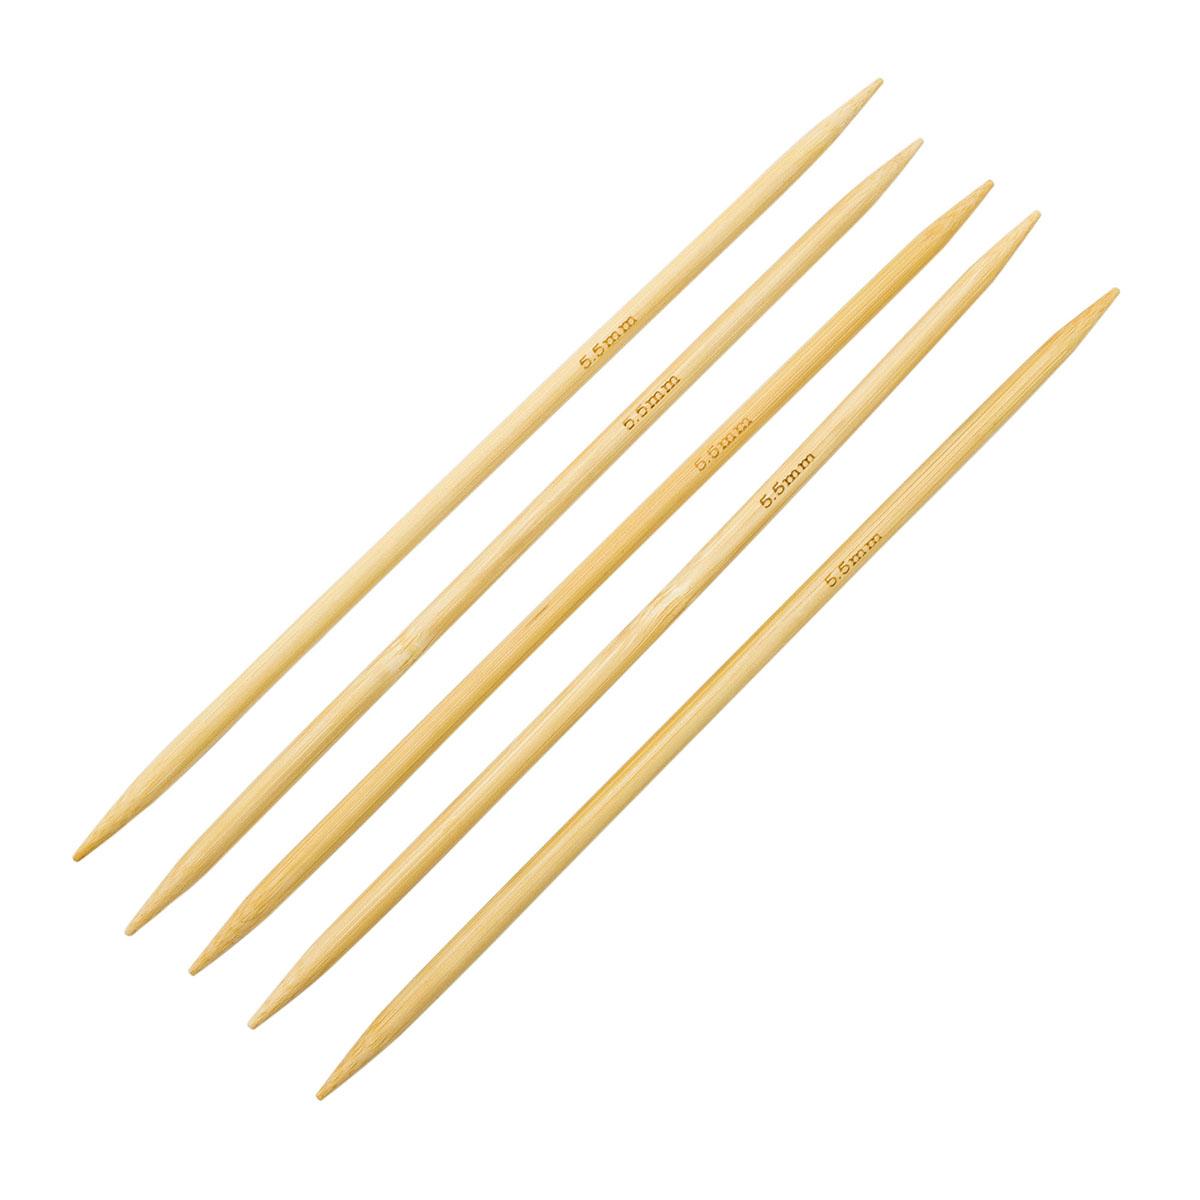 Спицы носочные бамбук 942555, 20 см, 5,5 мм, Hobby&Pro